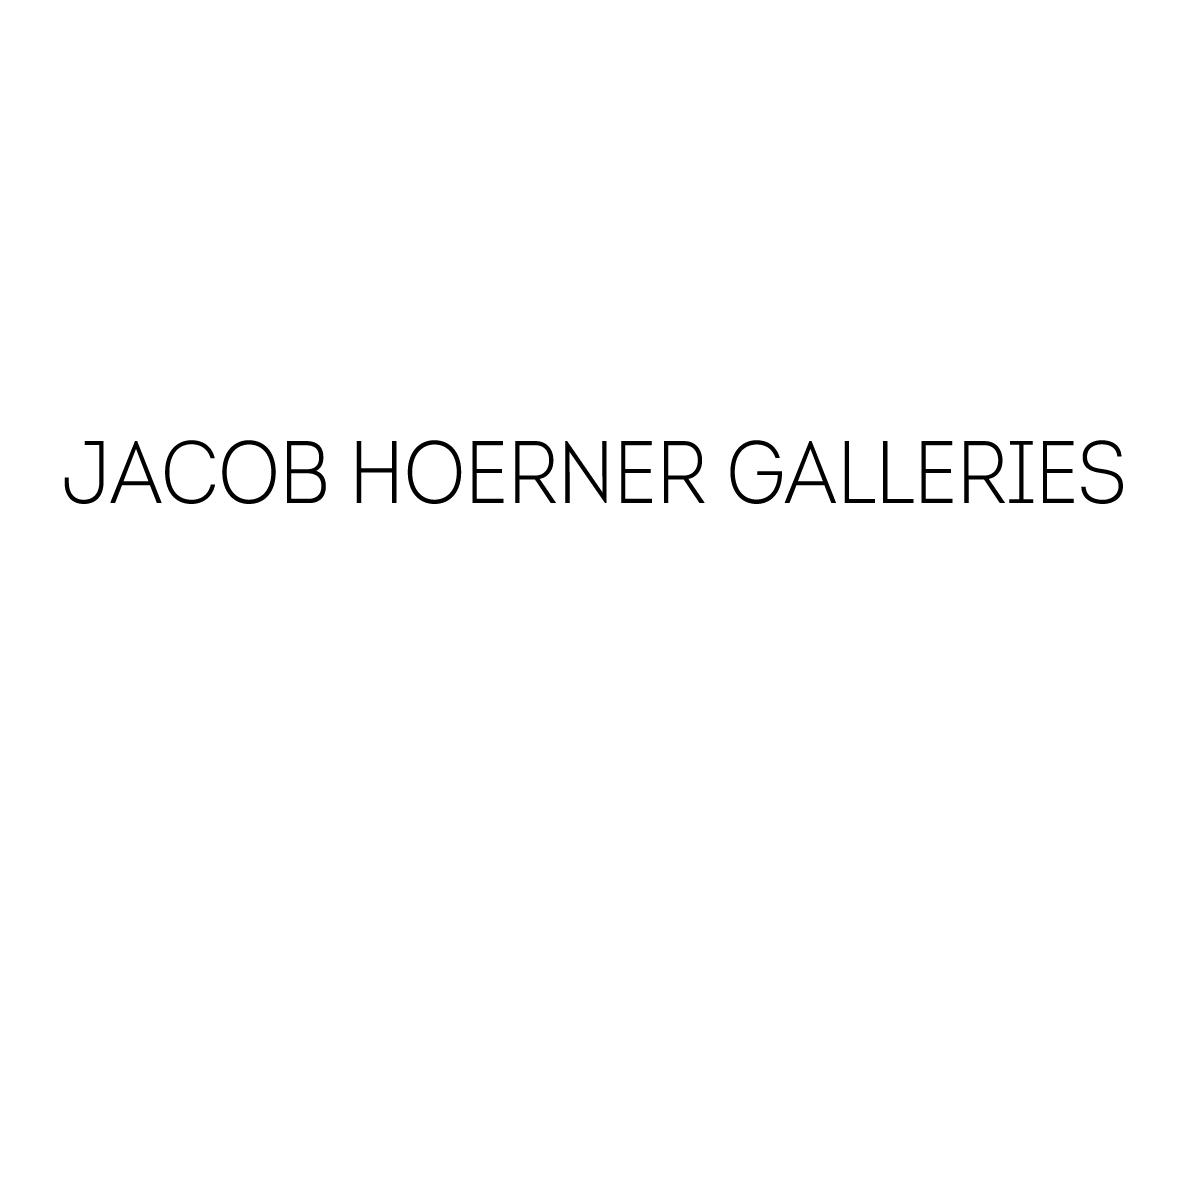 Jacob Hoerner Galleries